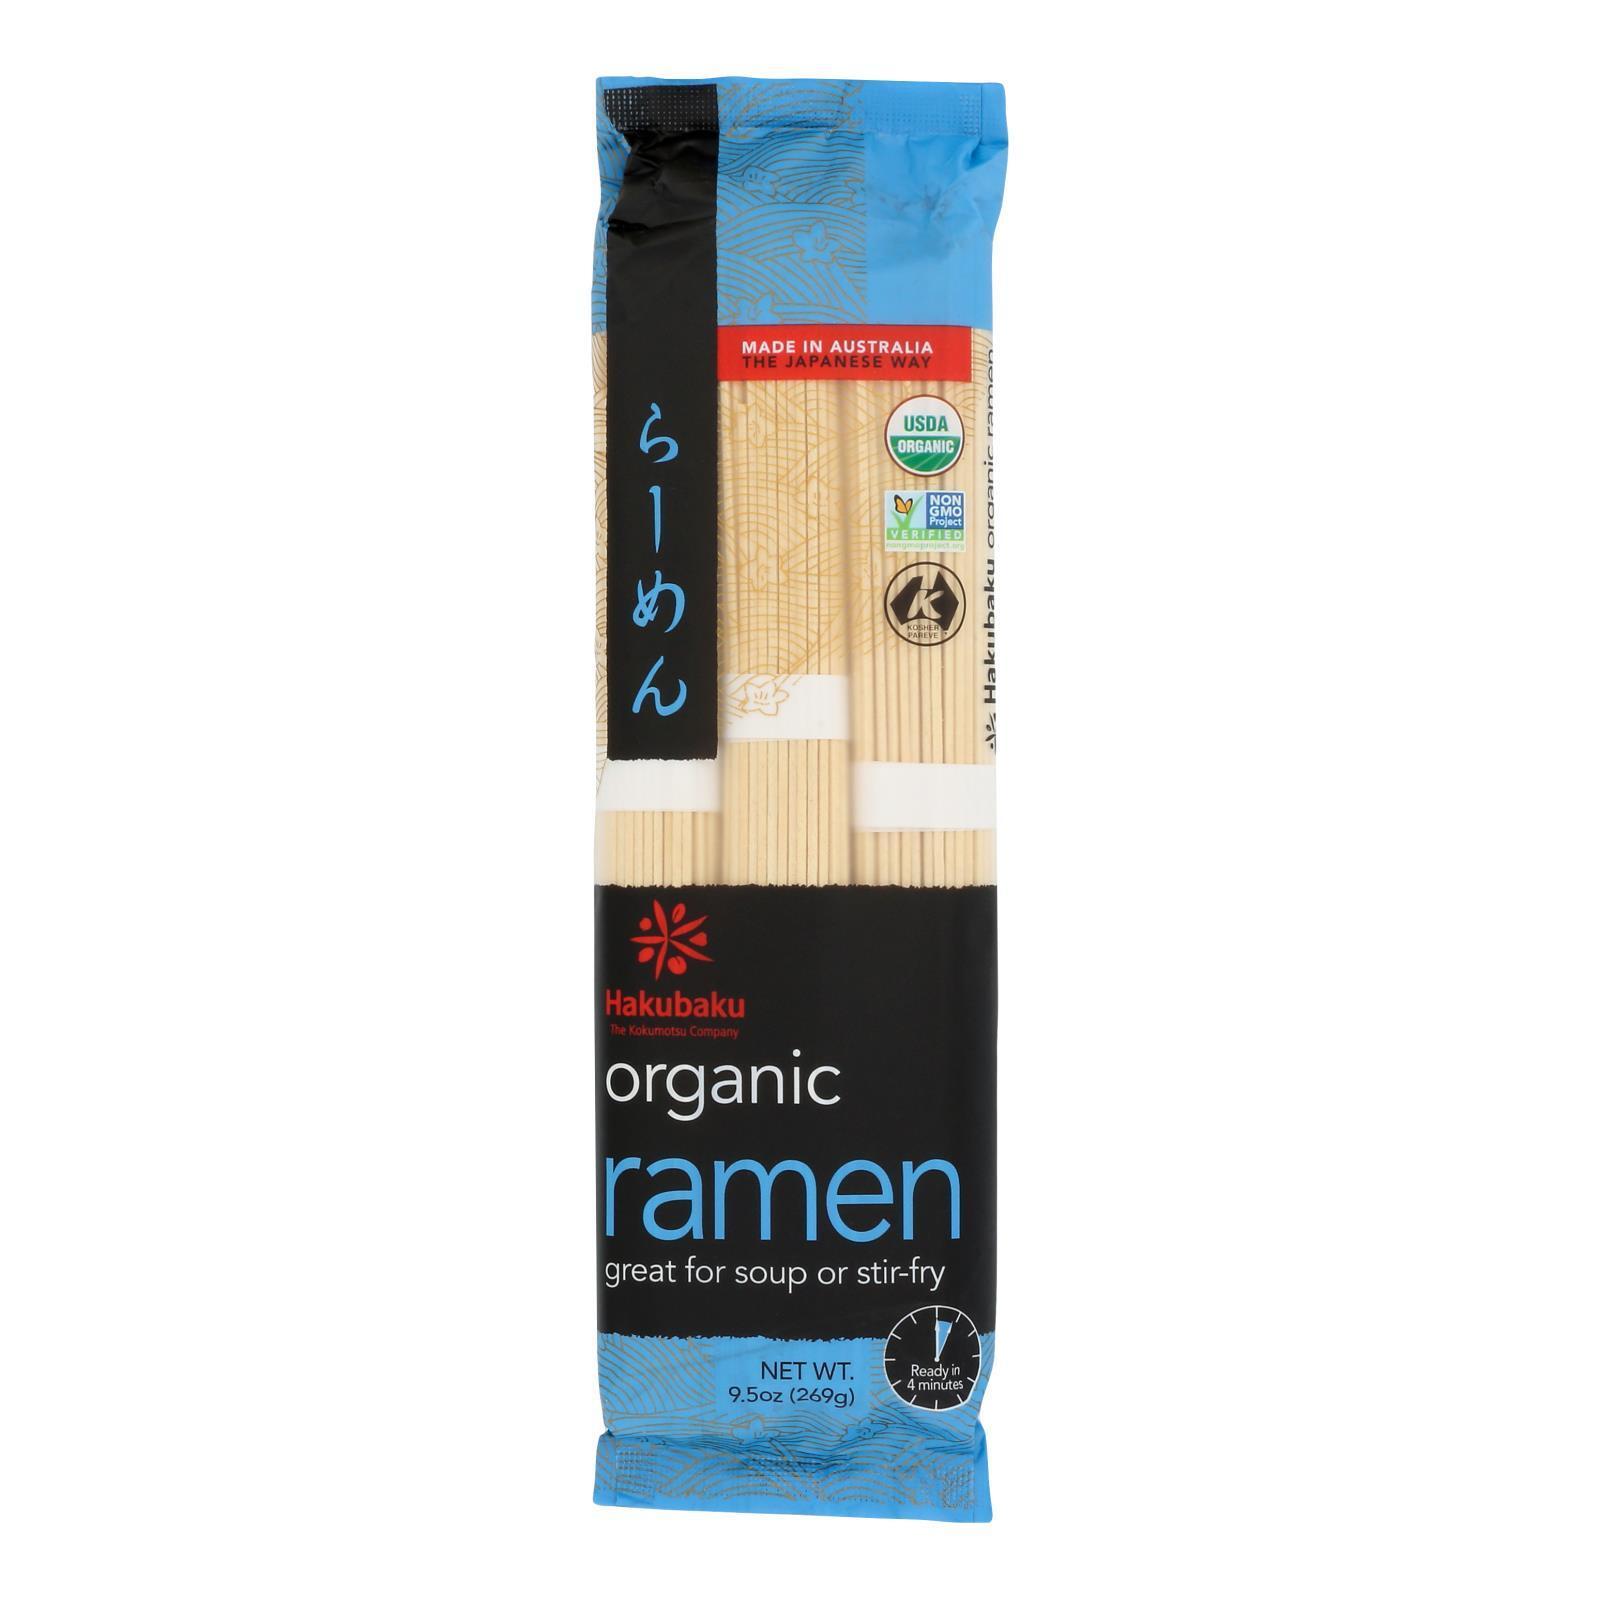 Hakubaku Organic Noodles - Ramen - Case of 8 - 9.52 oz